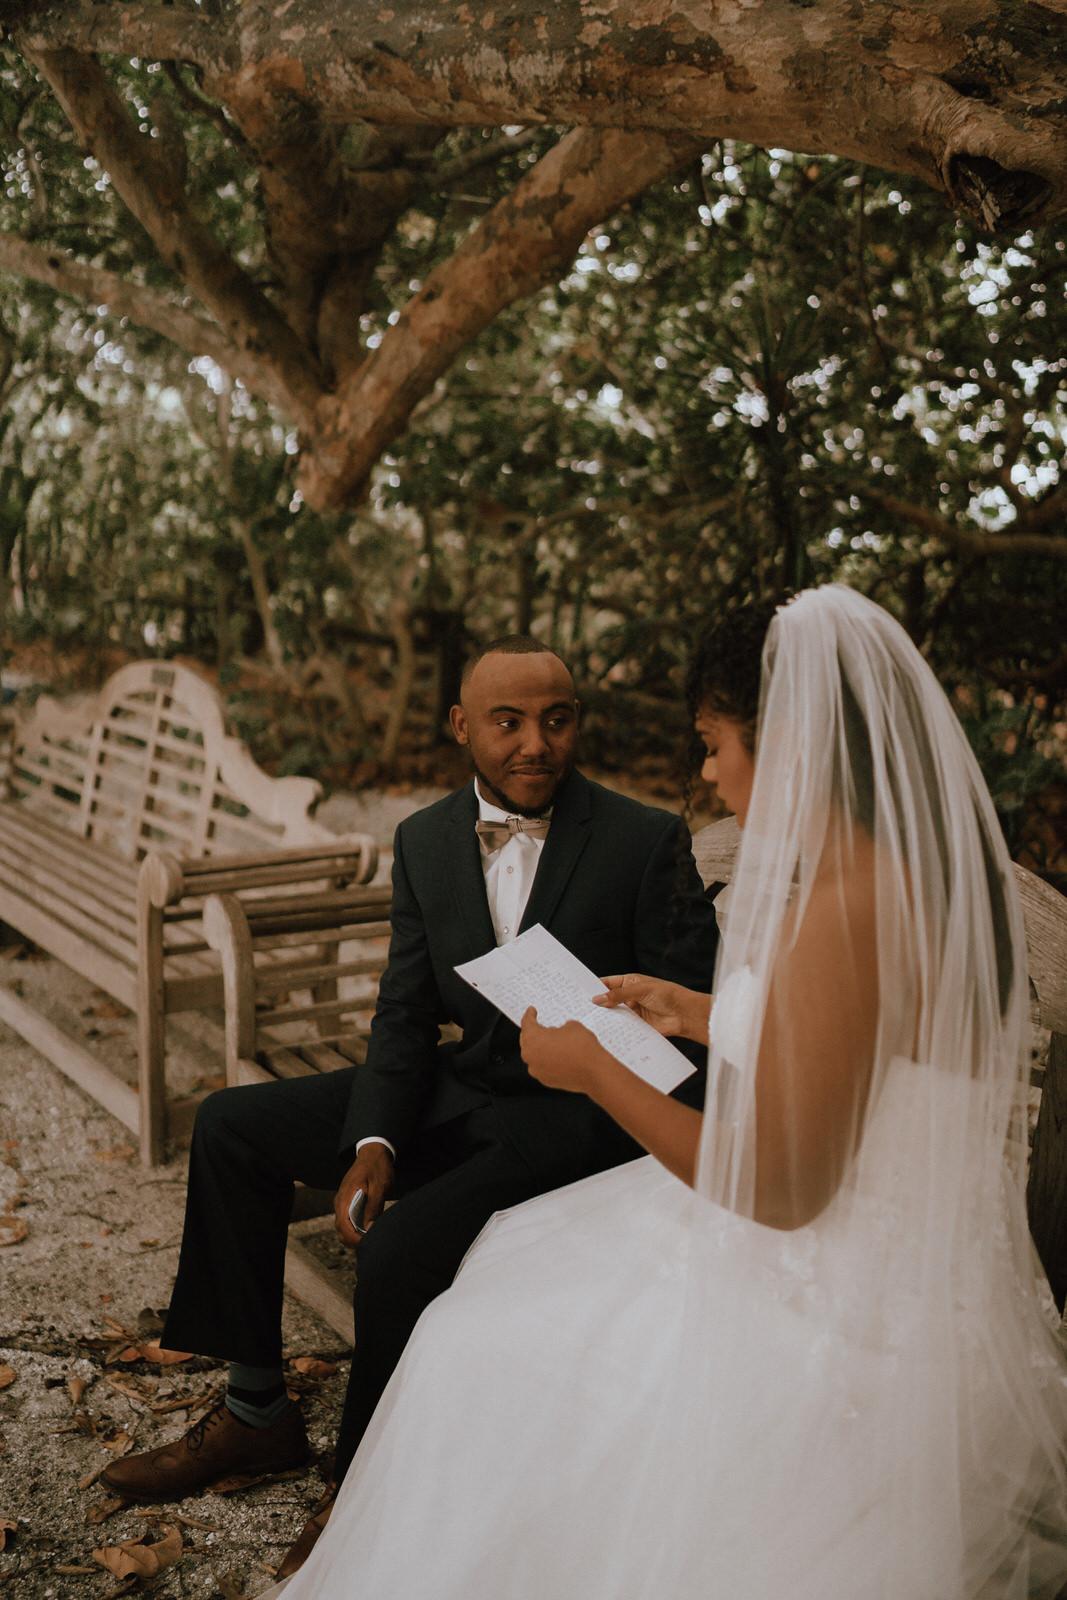 South Seas Island Resort Elopement- Alyana and Shawn- Michelle Gonzalez Photography-192.JPG